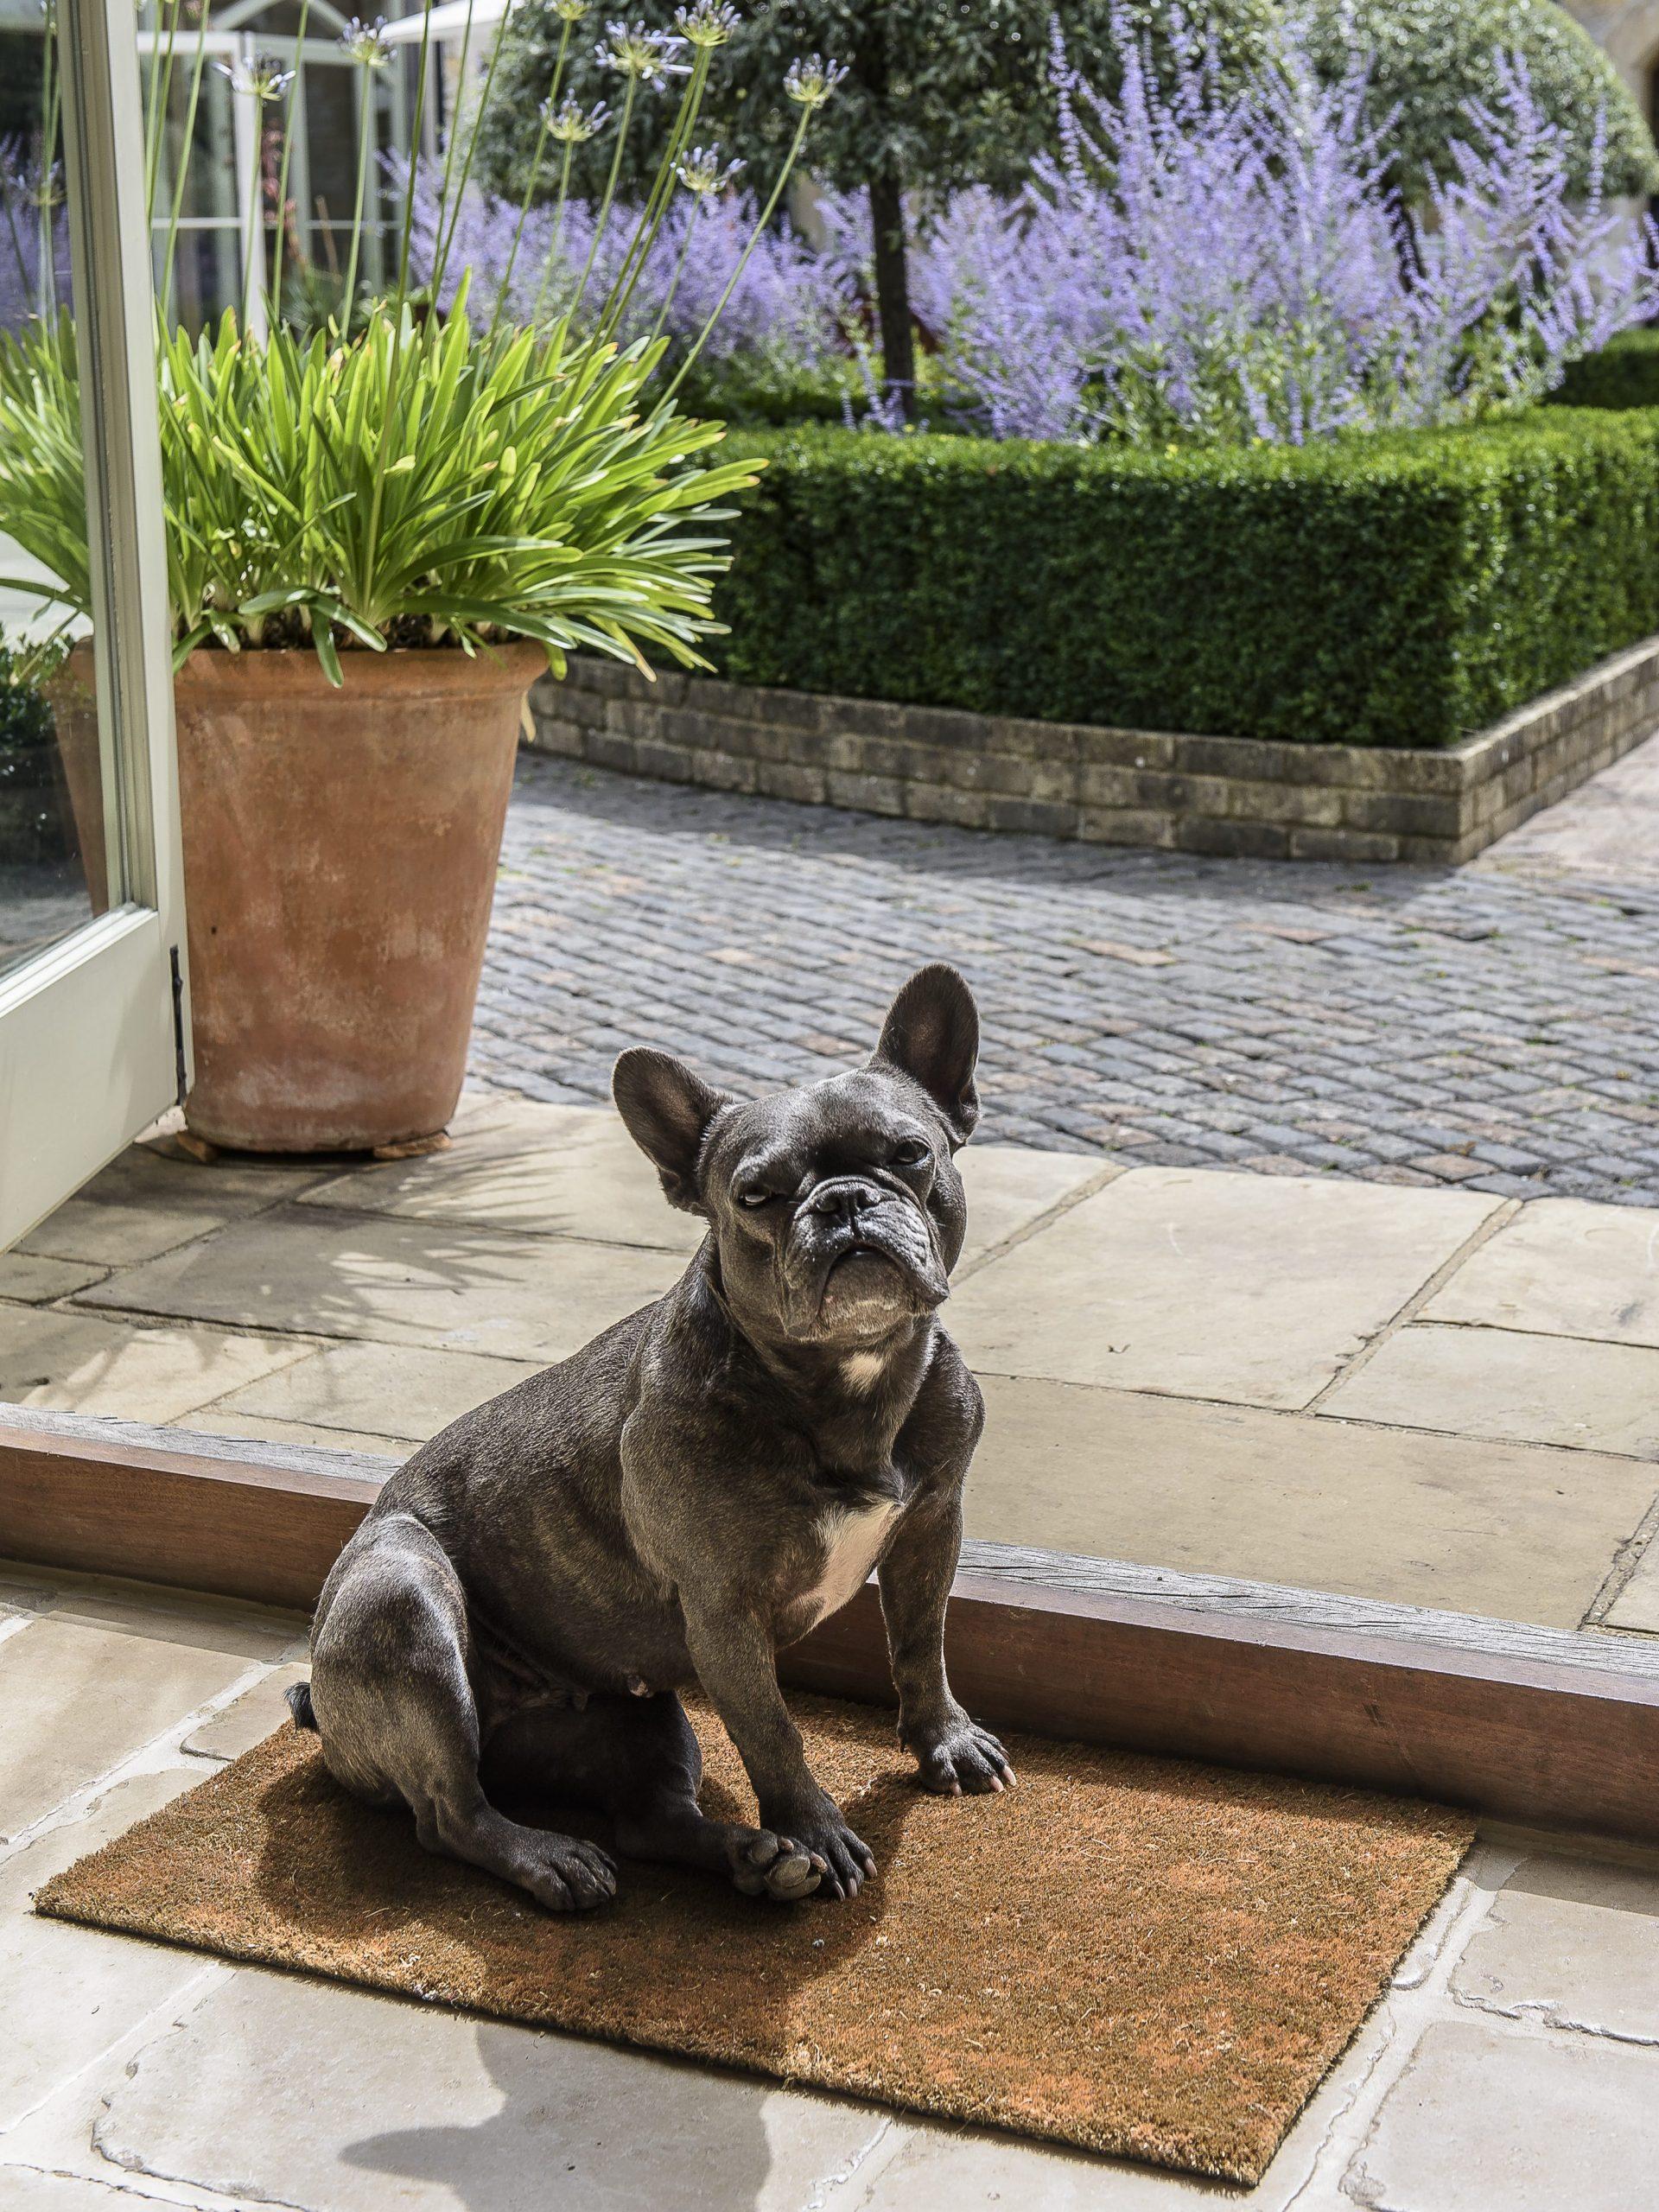 French Bulldog soaks up some sunshine in the kitchen.